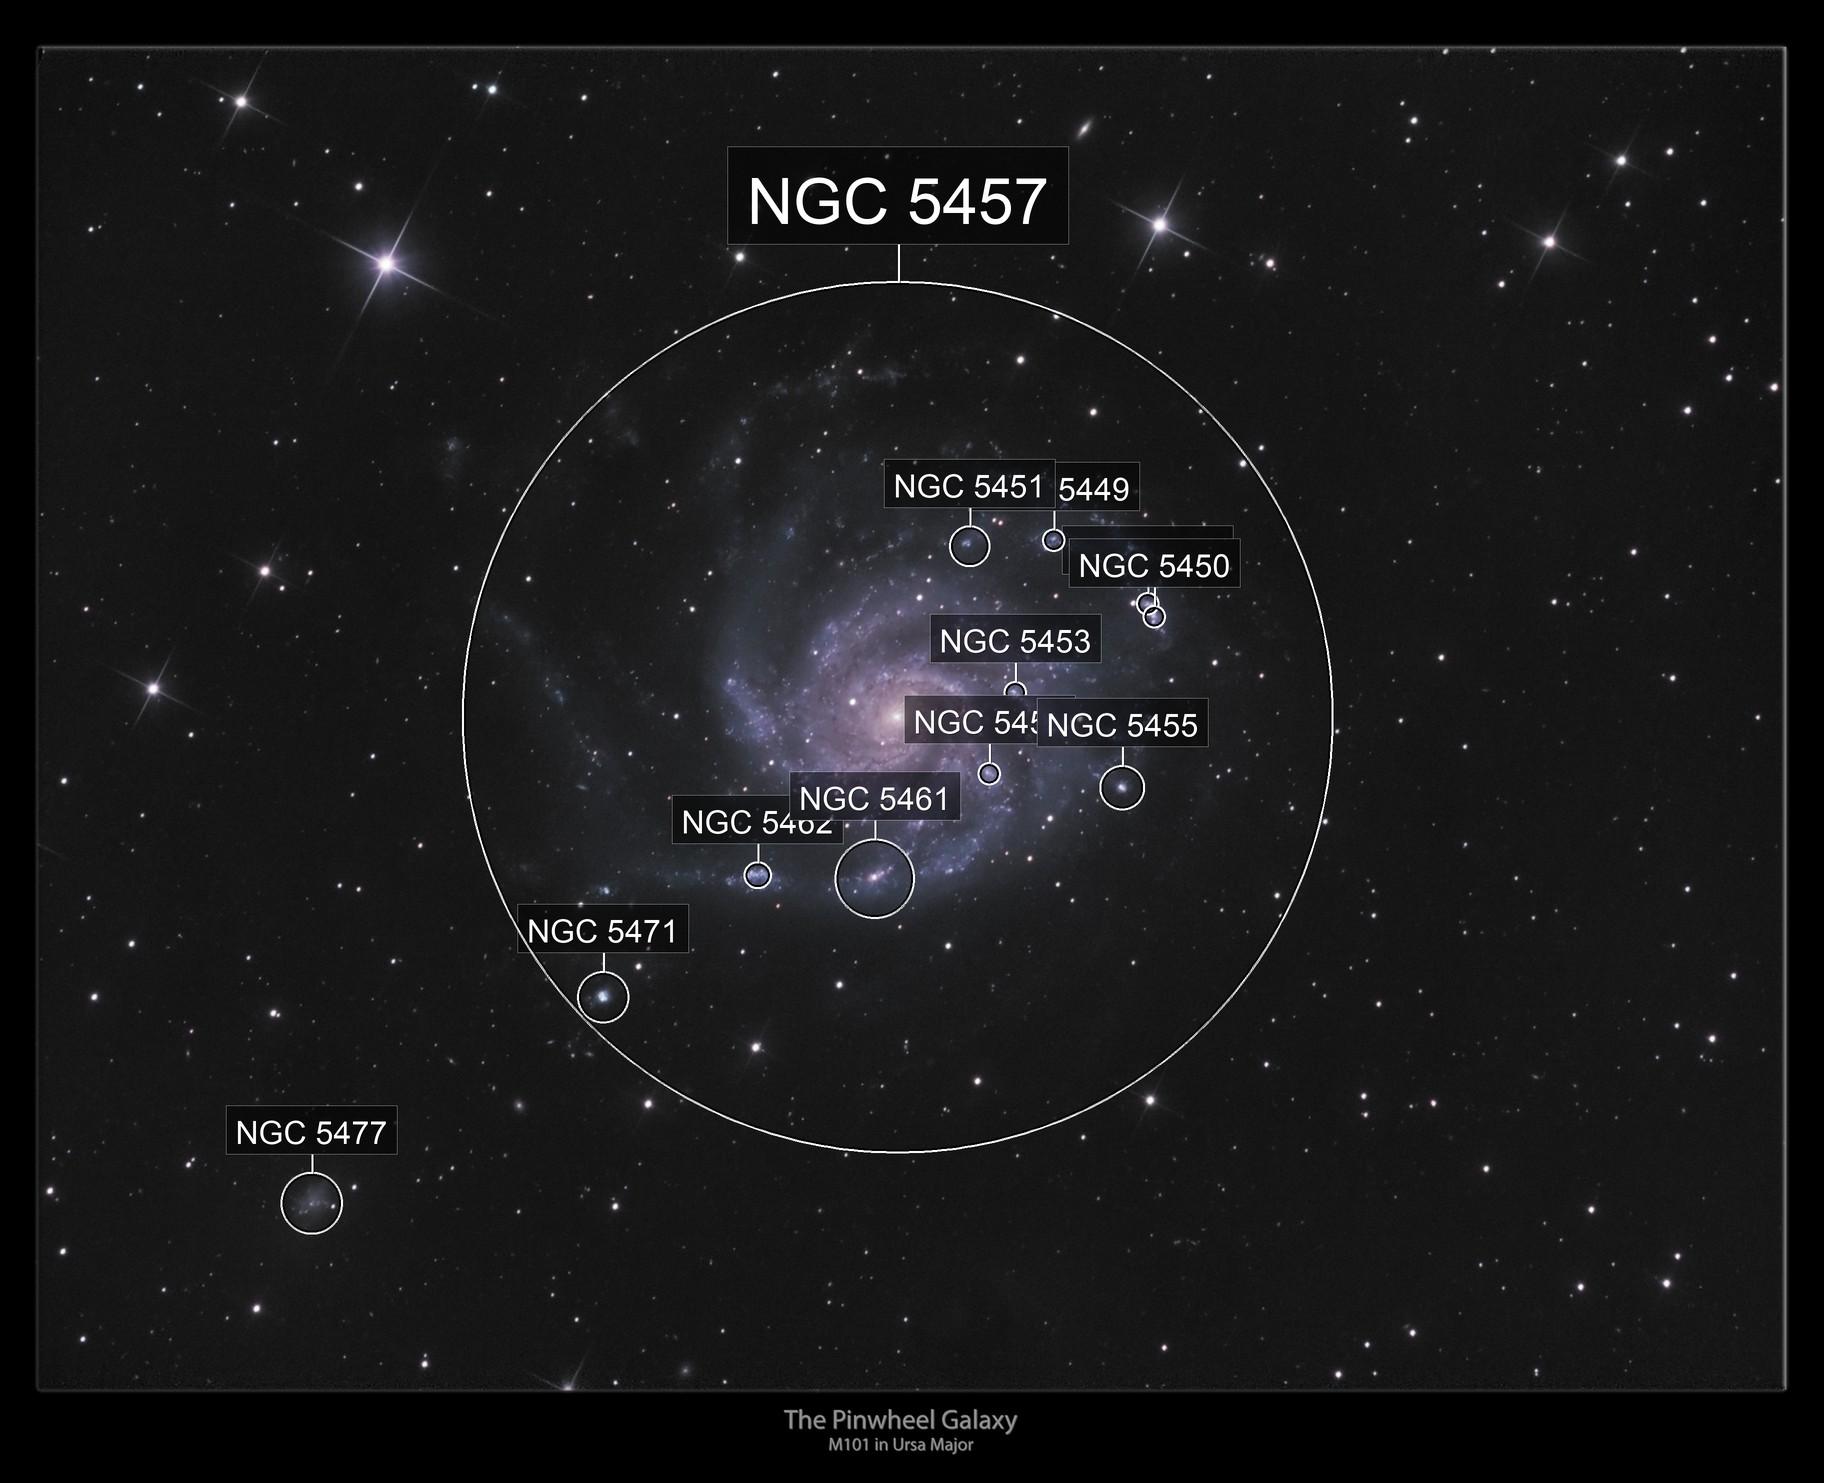 The Pinwheel Galaxy- M101